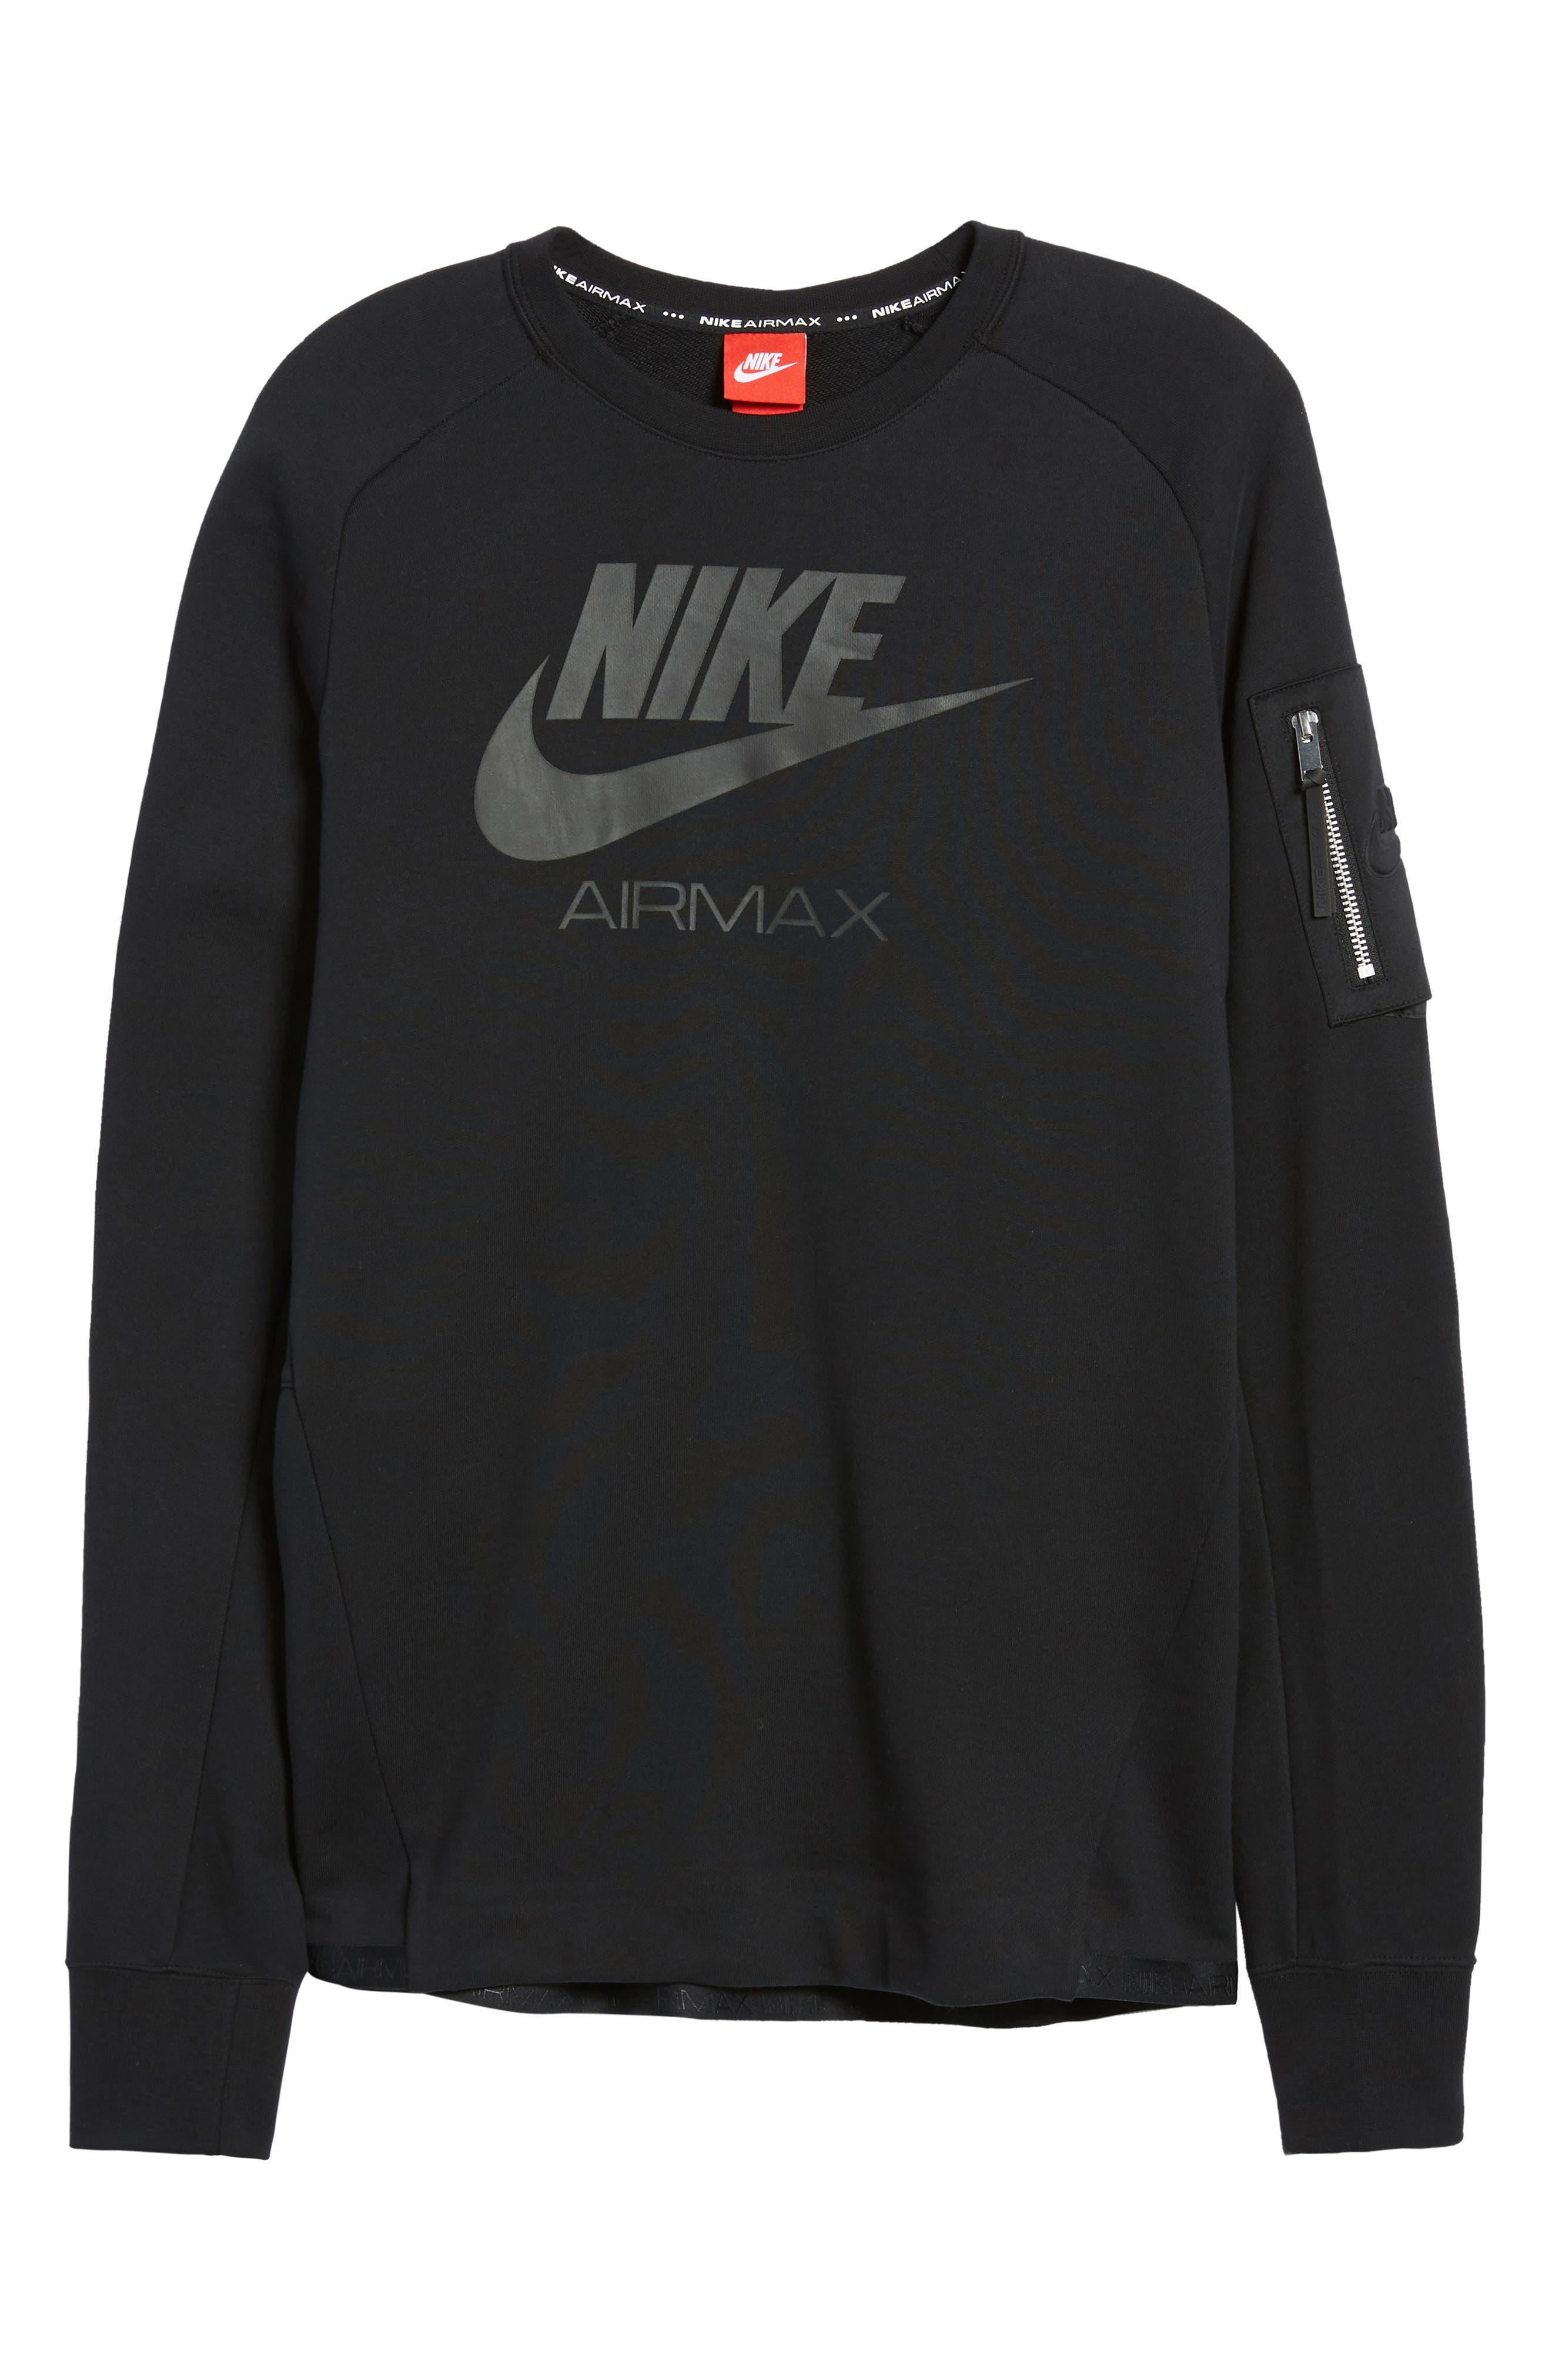 NSW Air Max Crewneck Sweatshirt,                             Alternate thumbnail 6, color,                             Black/ Black/ Black